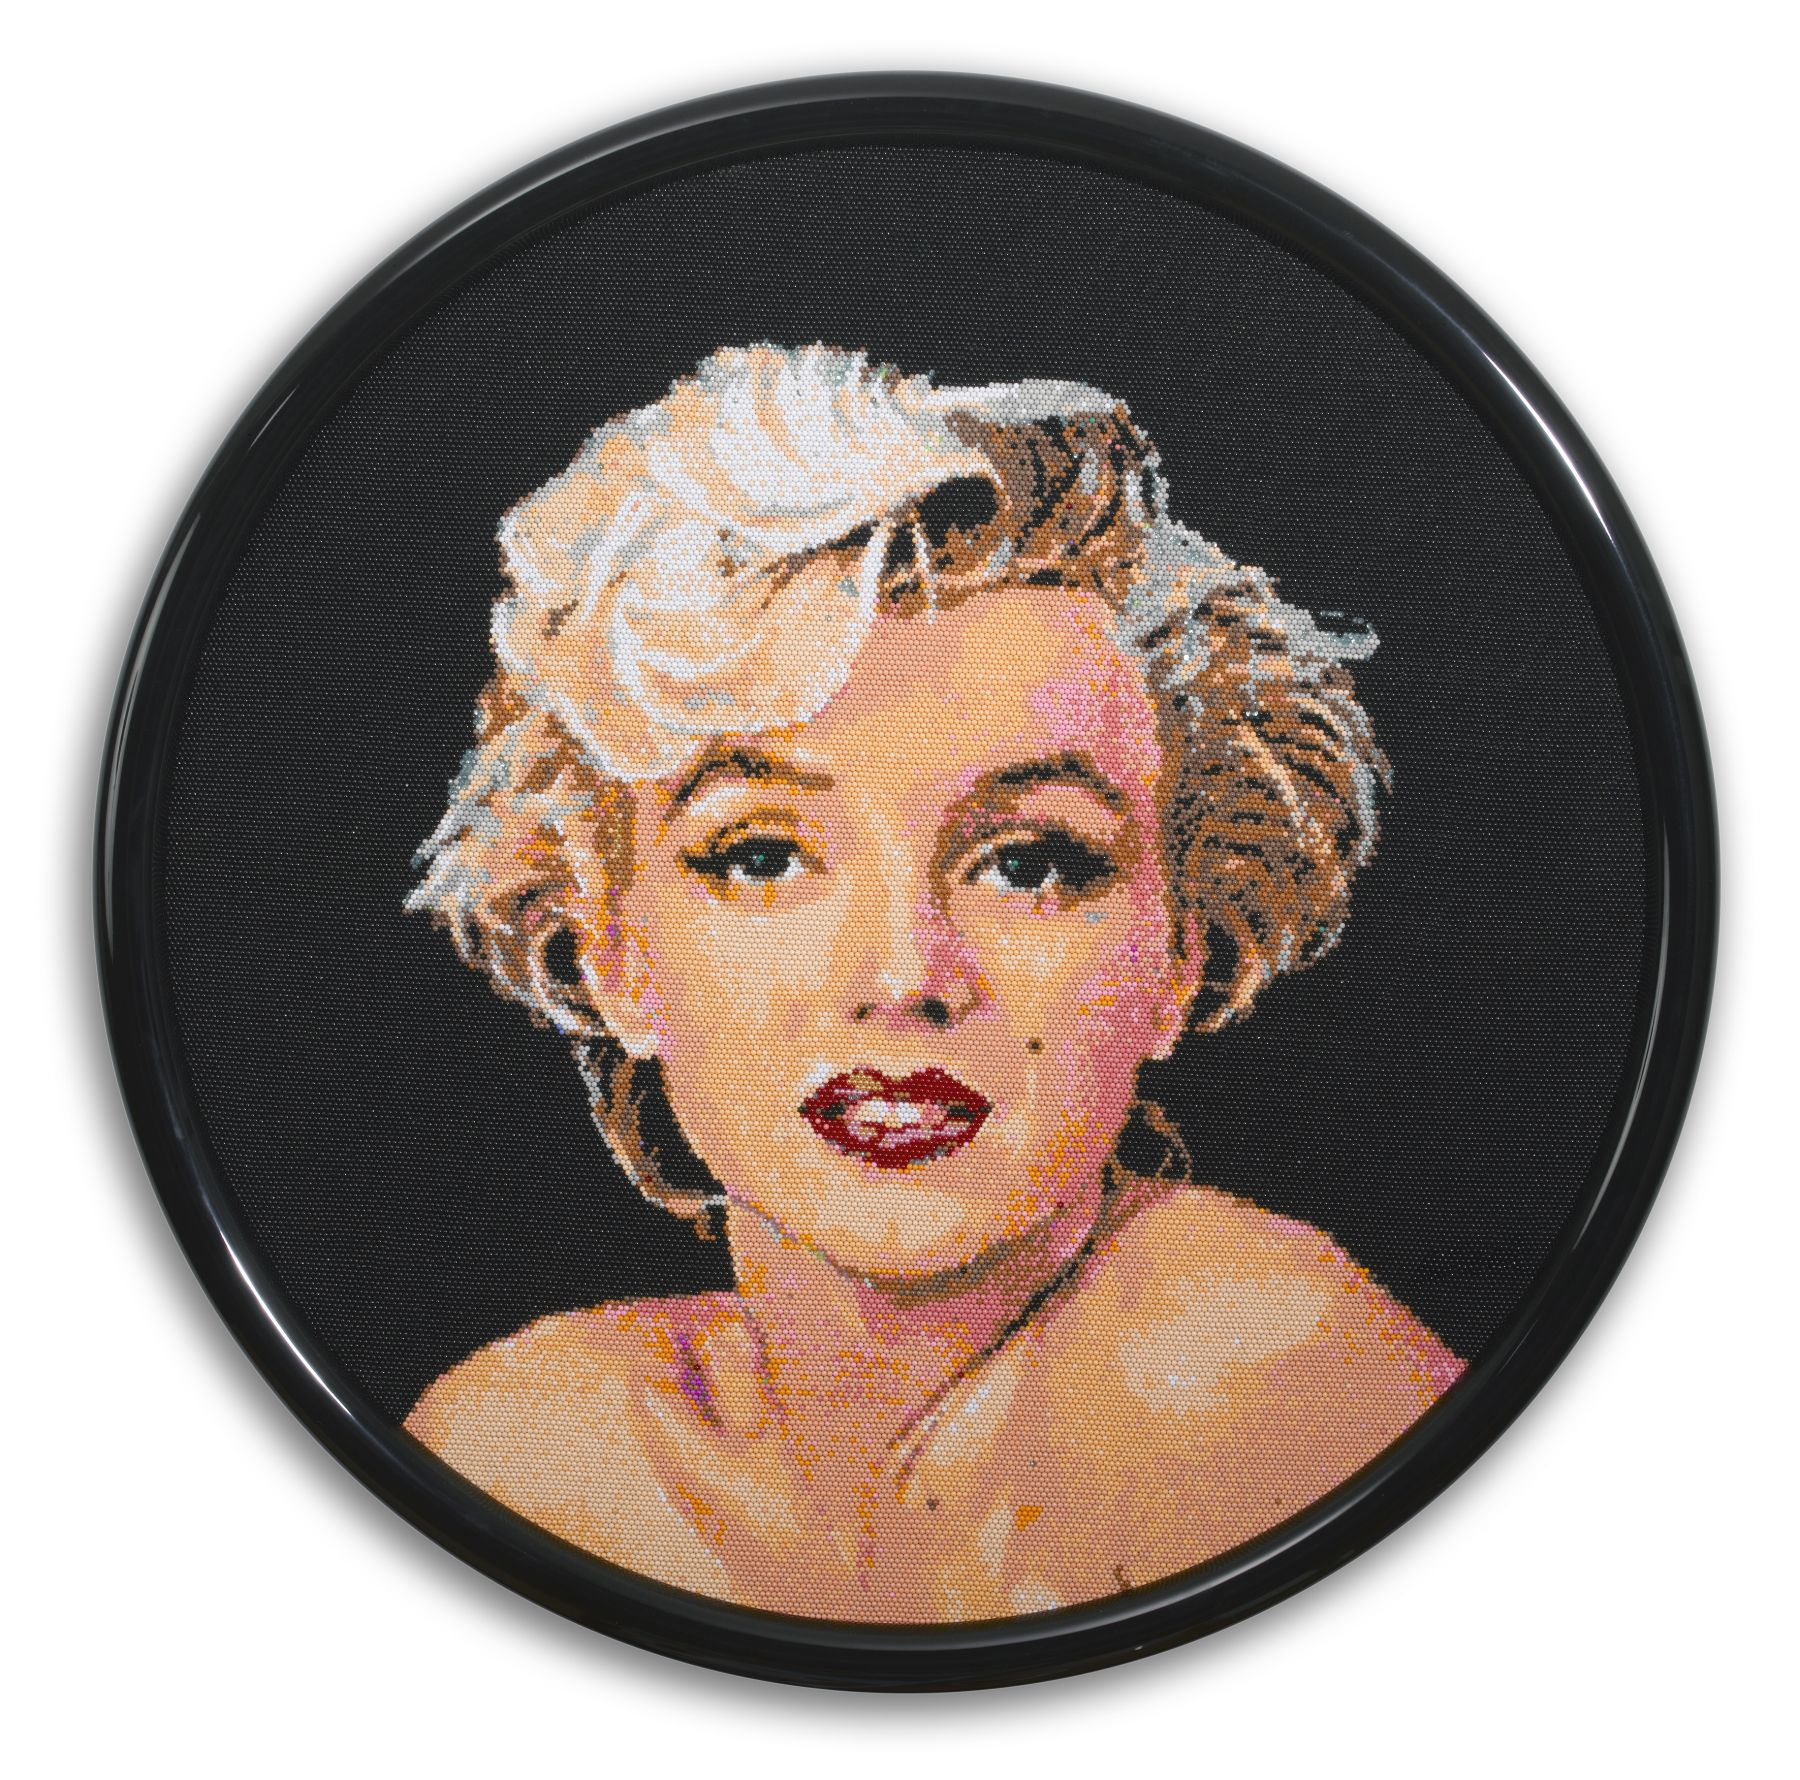 david mach, Marilyn Monroe, 2013, pushpins, 39 1/4 inches diameter